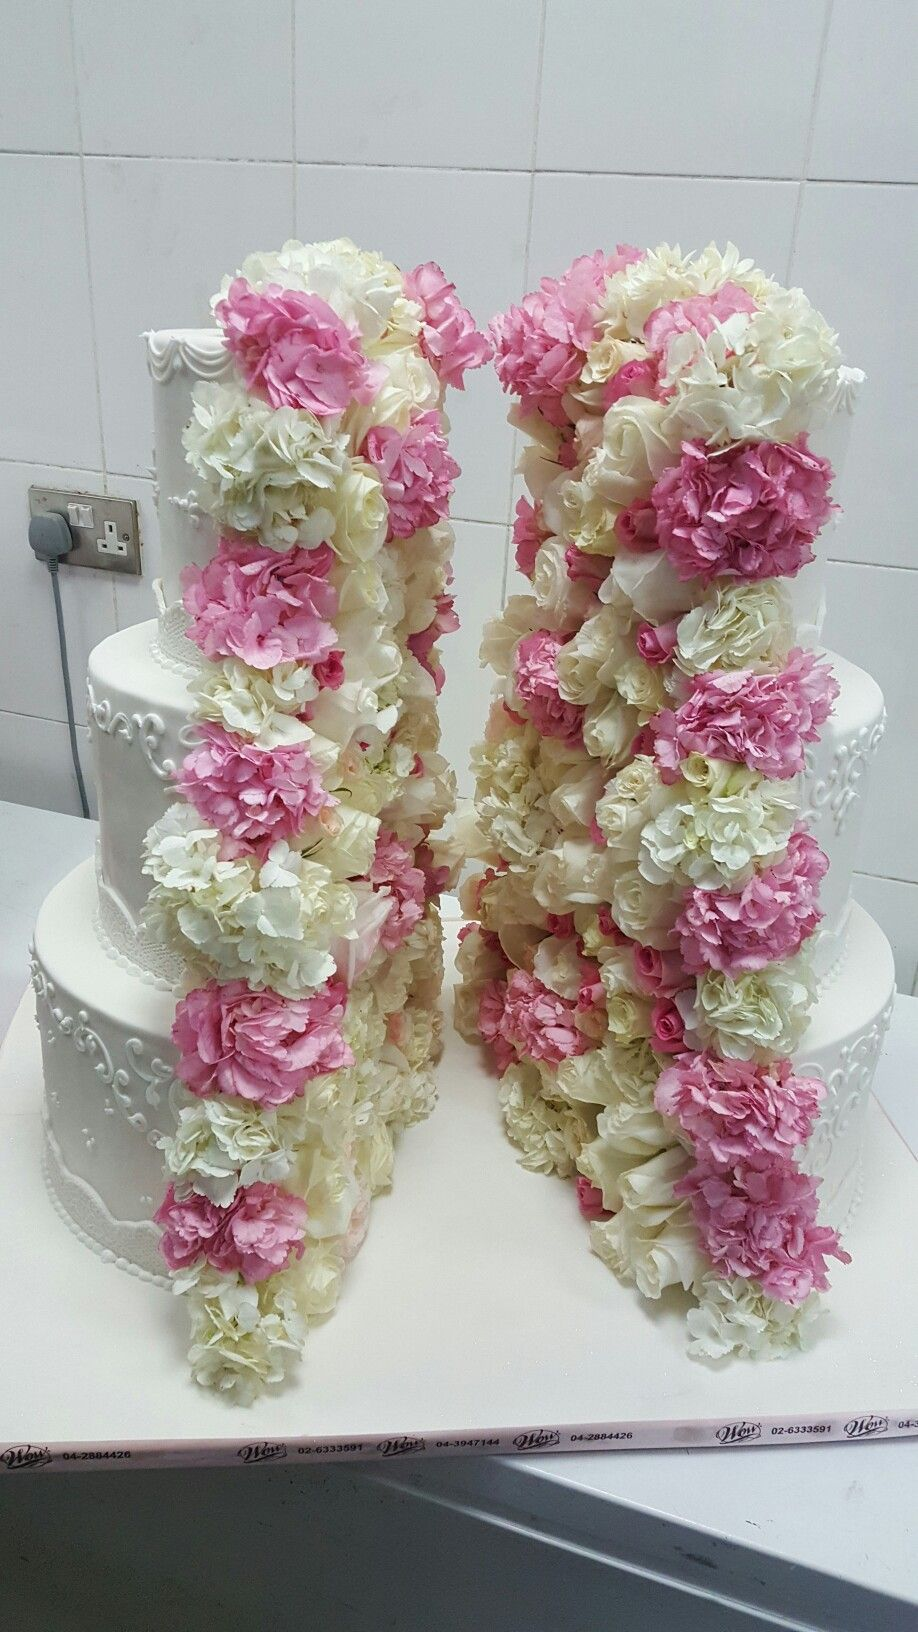 Pin by chefbabu reddy on royal wedding cakes pinterest cake